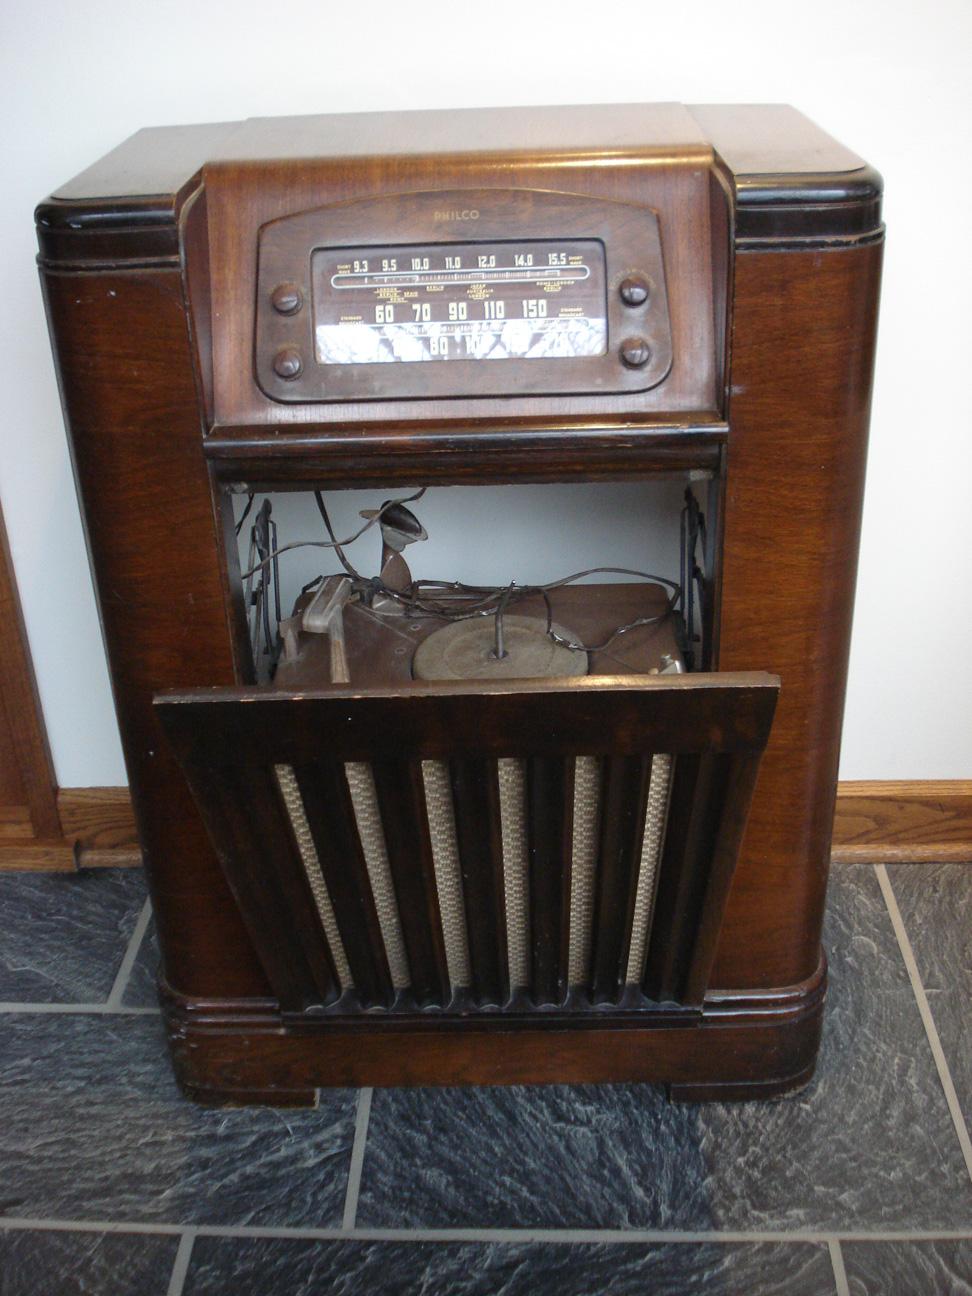 Philco Radio & Phonograph, Model # 46-1226, 1946